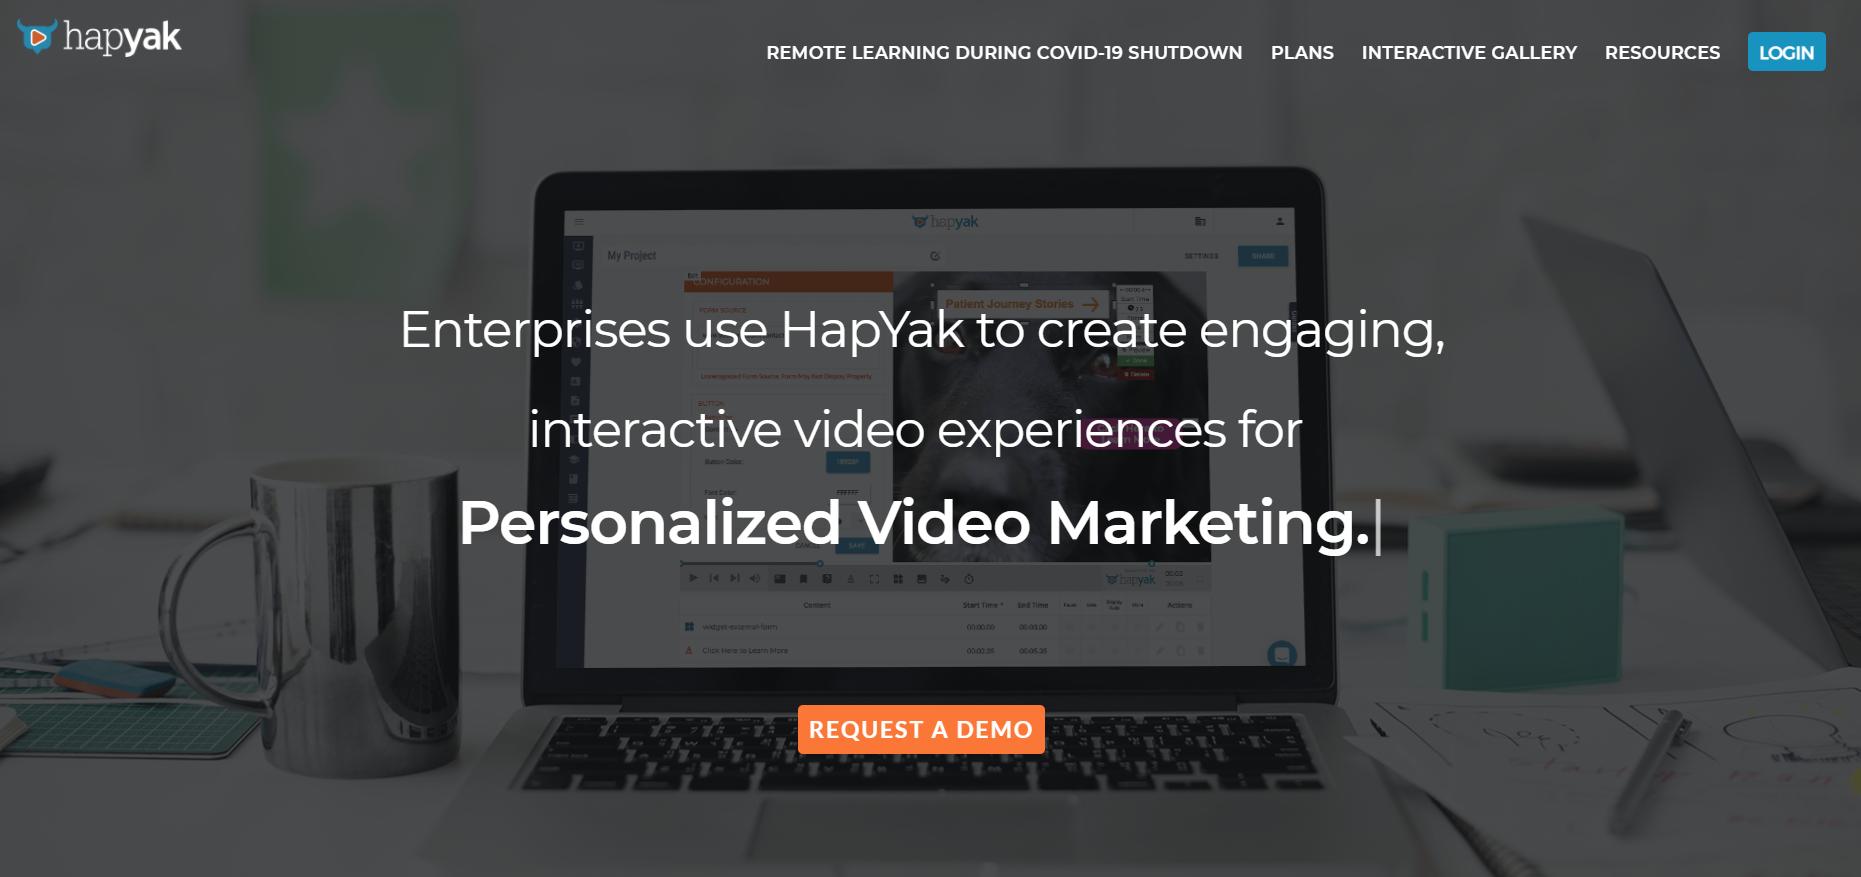 hapyak-interactive-video-creation-platform